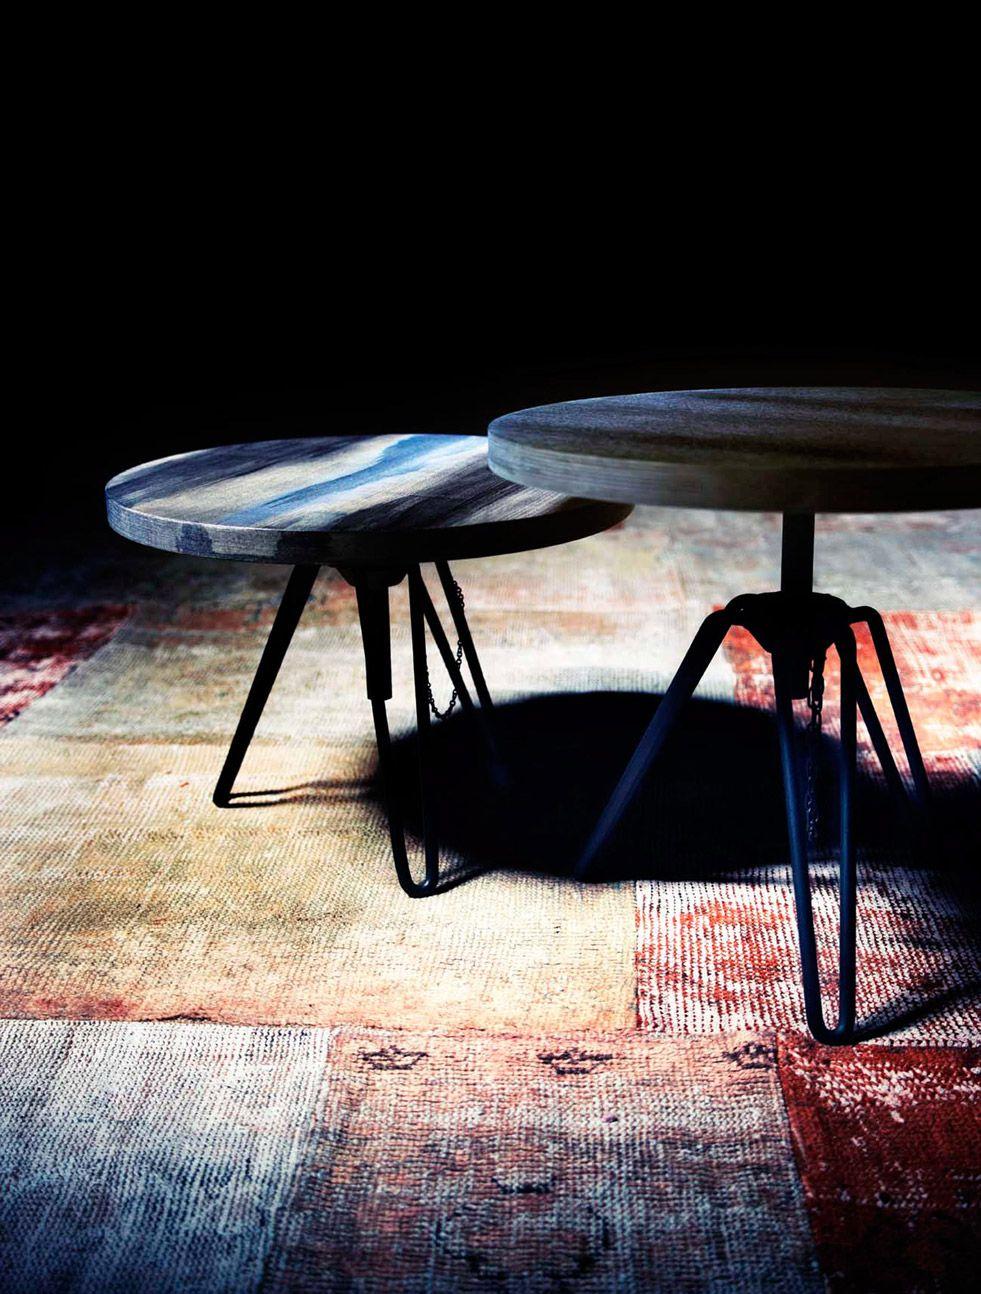 Pin By Pilatos Megastore On Design Furniture Collection Table Base Design Furniture [ 1294 x 981 Pixel ]